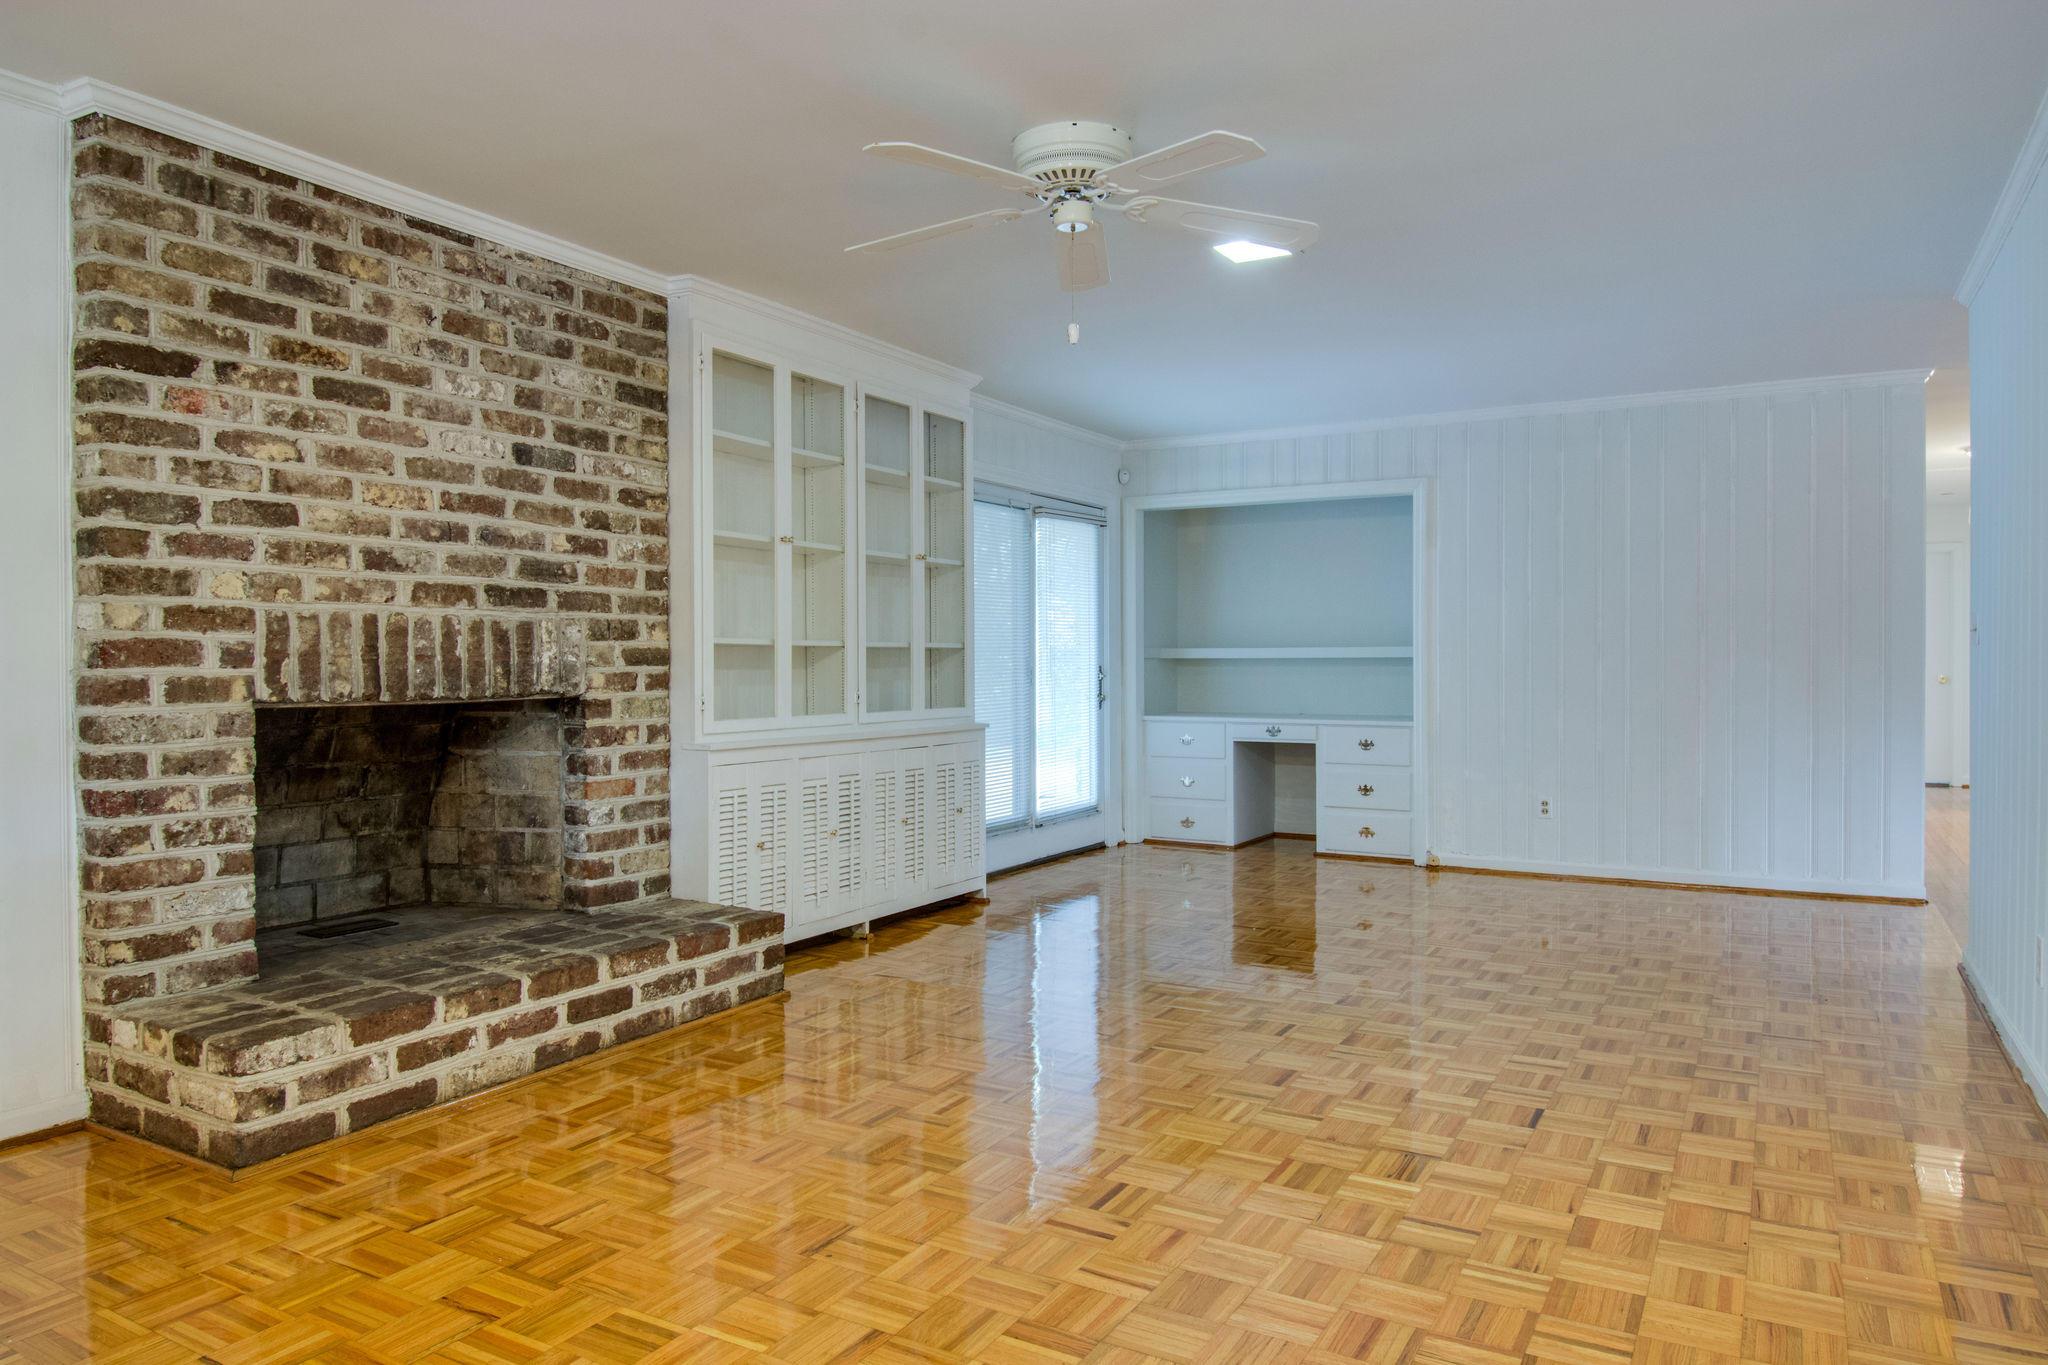 Northbridge Terrace Homes For Sale - 1114 Northbridge, Charleston, SC - 3